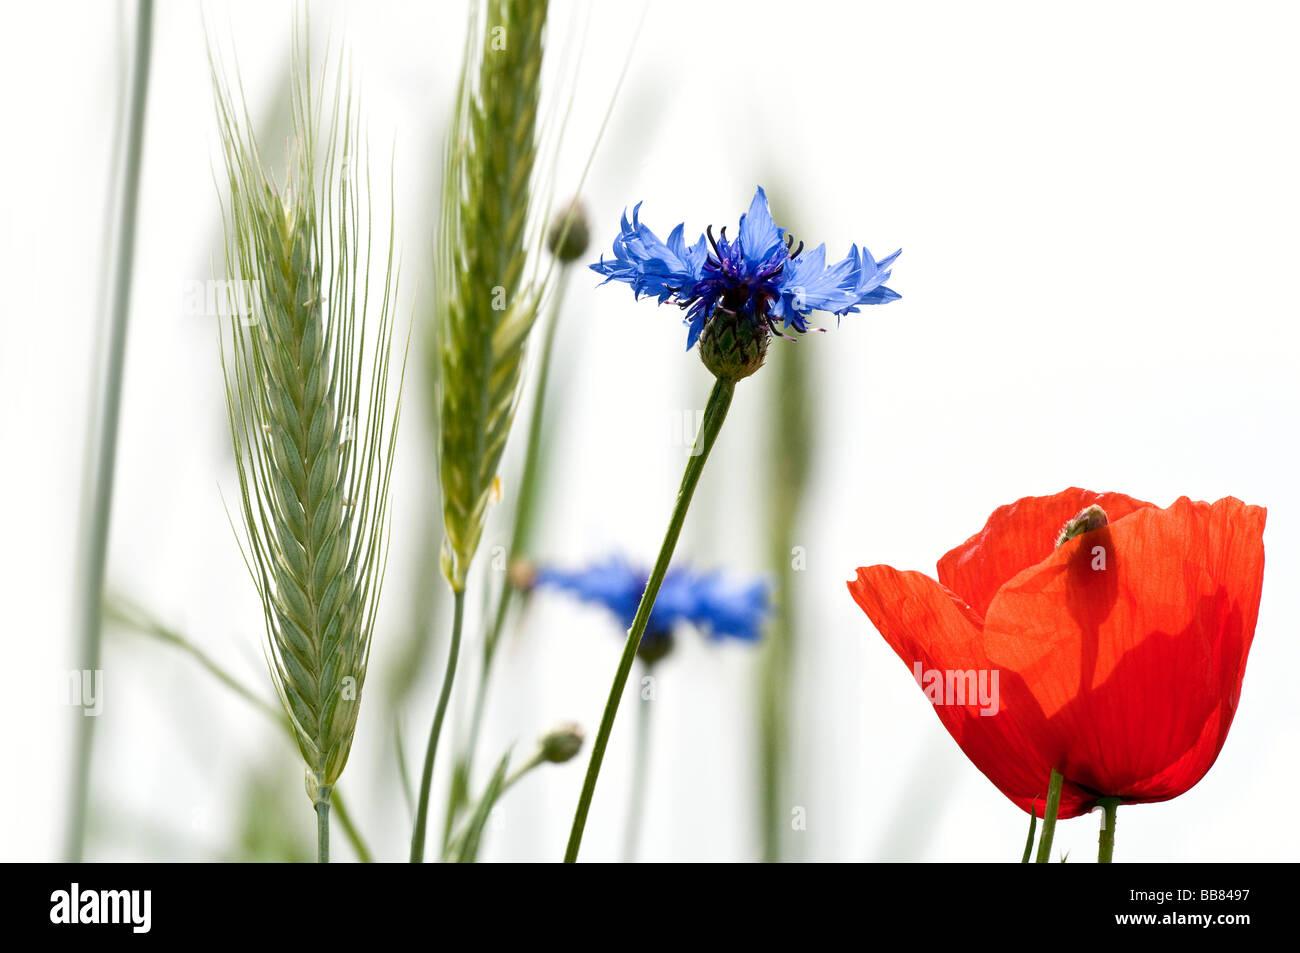 Cornflowers, poppy blossom and wheat - Stock Image